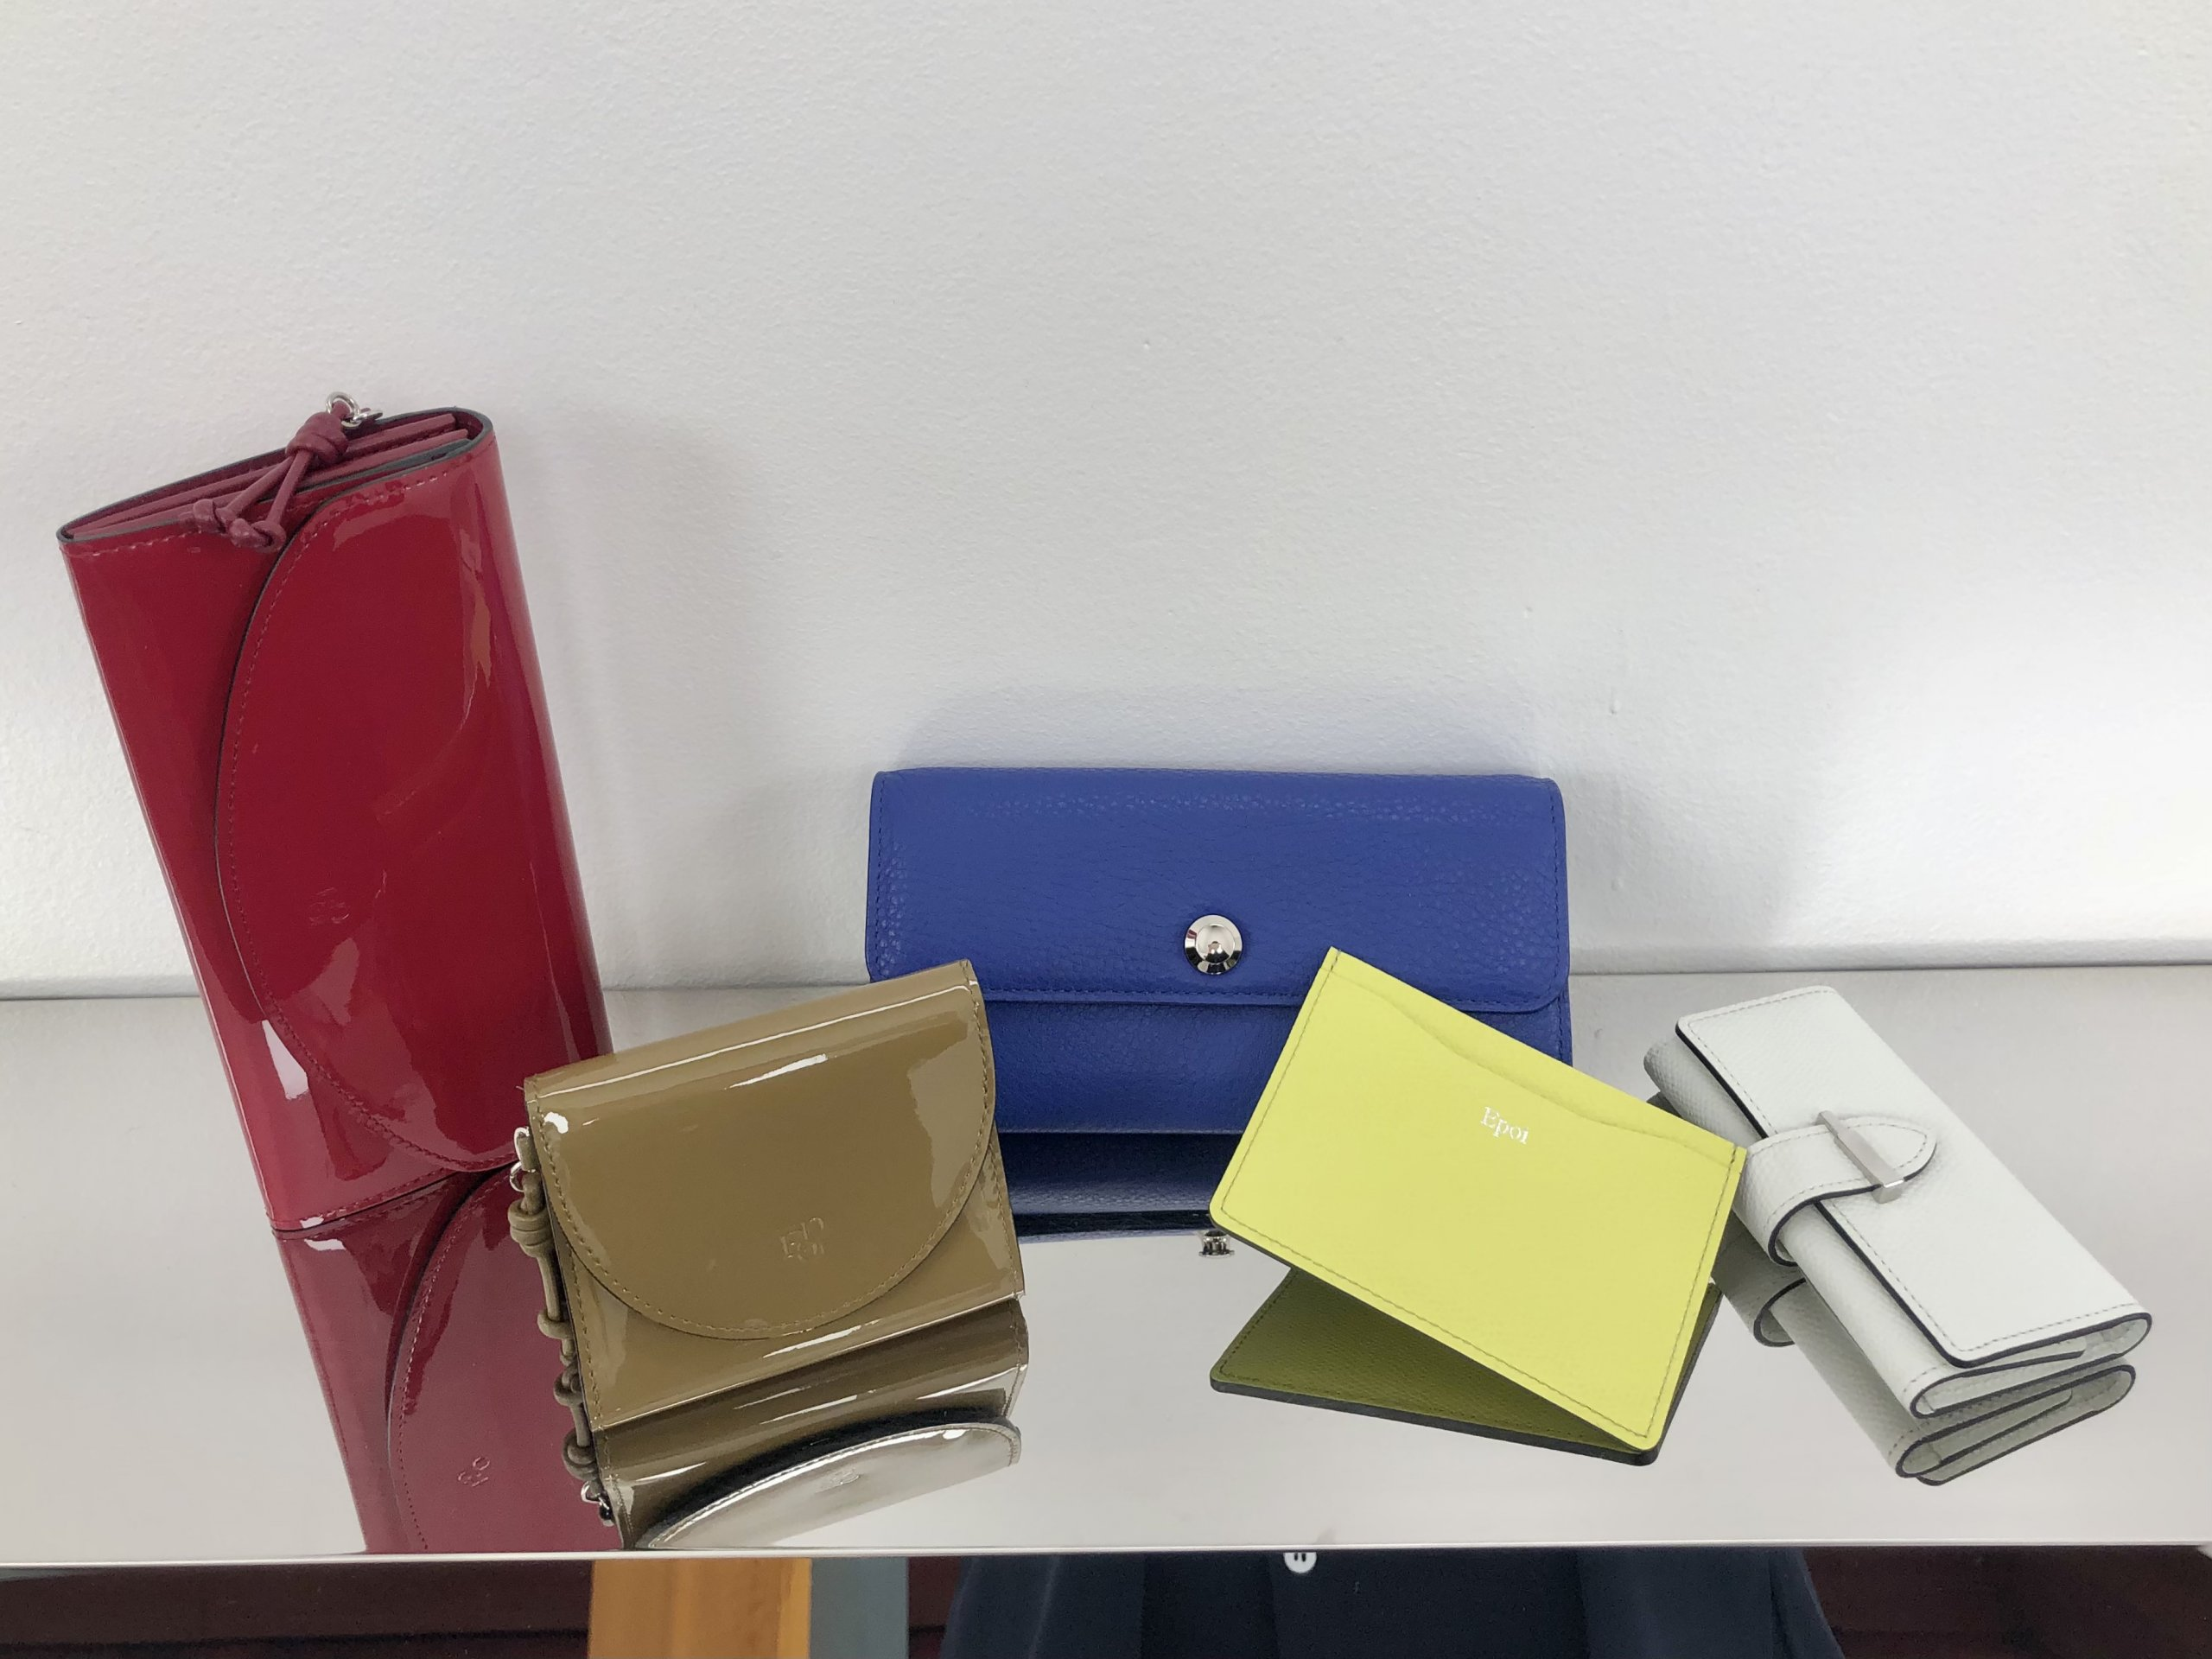 【Epoi本店】SALE商品のご紹介 財布・小物編 ※完売情報追記あり